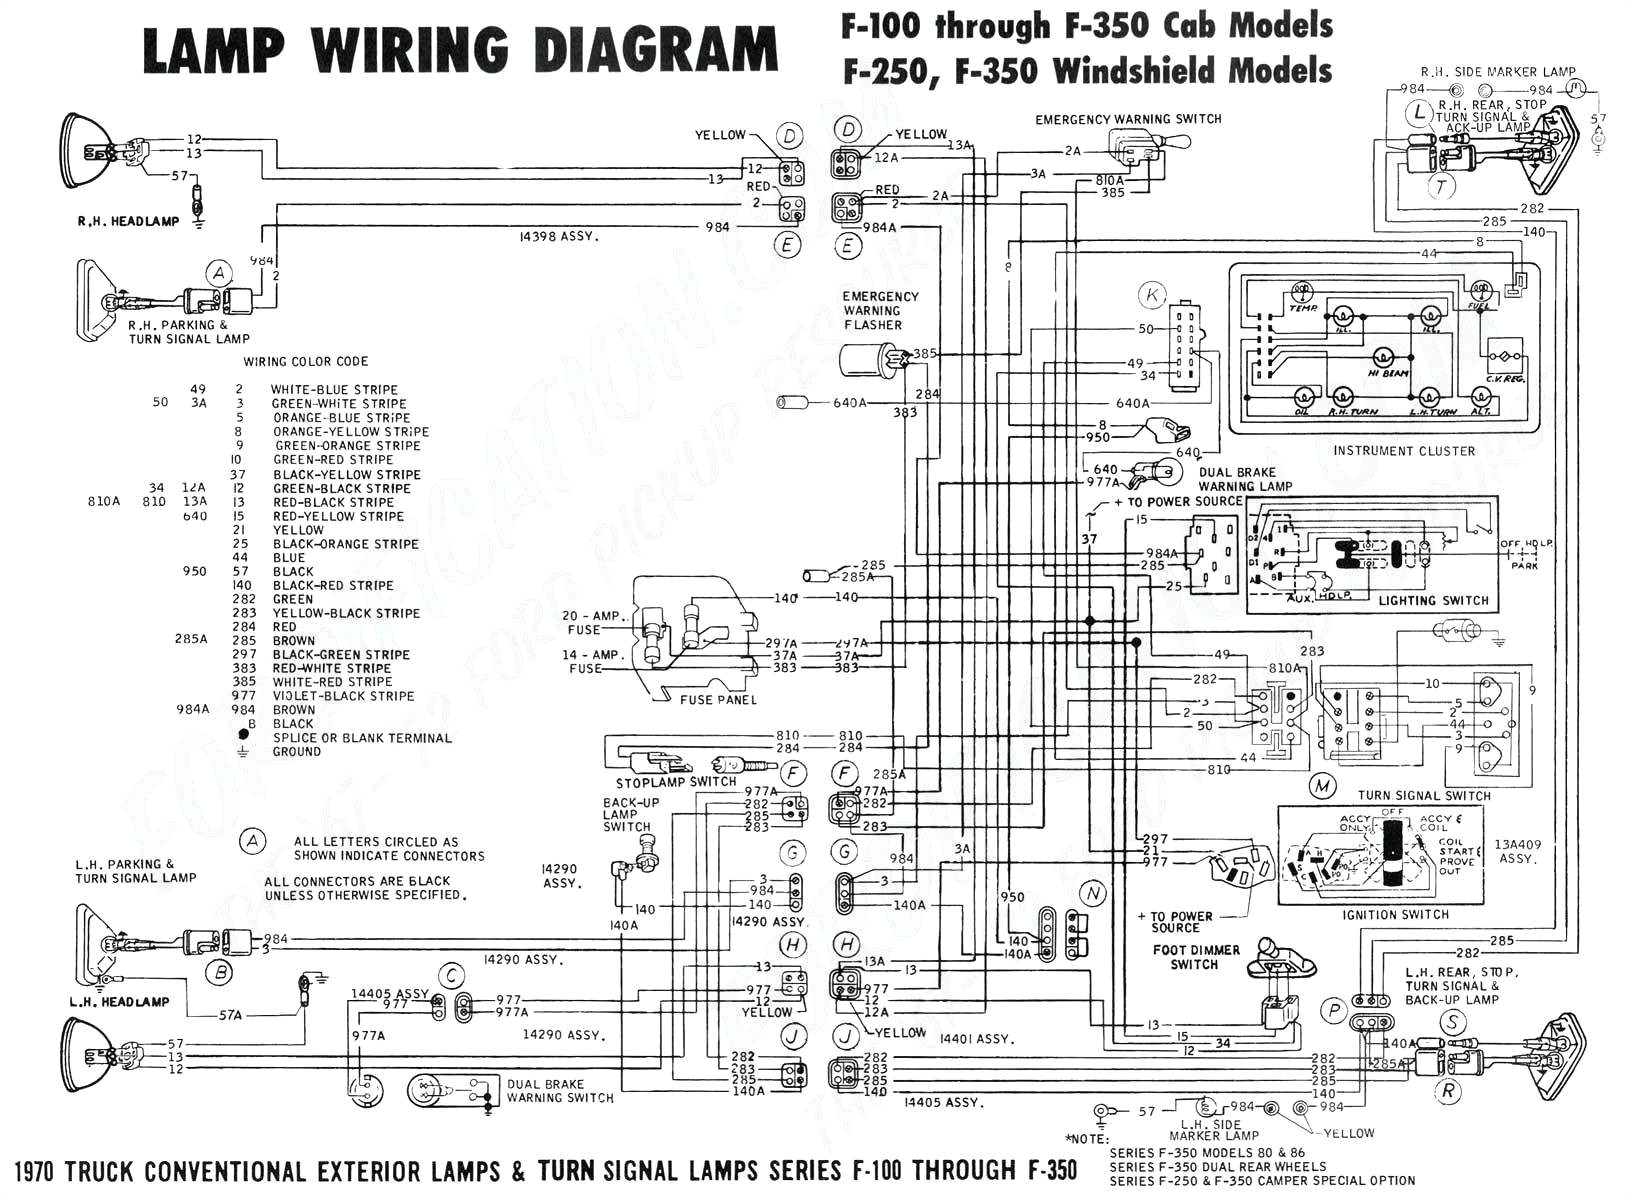 Gmc Trailer Wiring Schematic from autocardesign.org